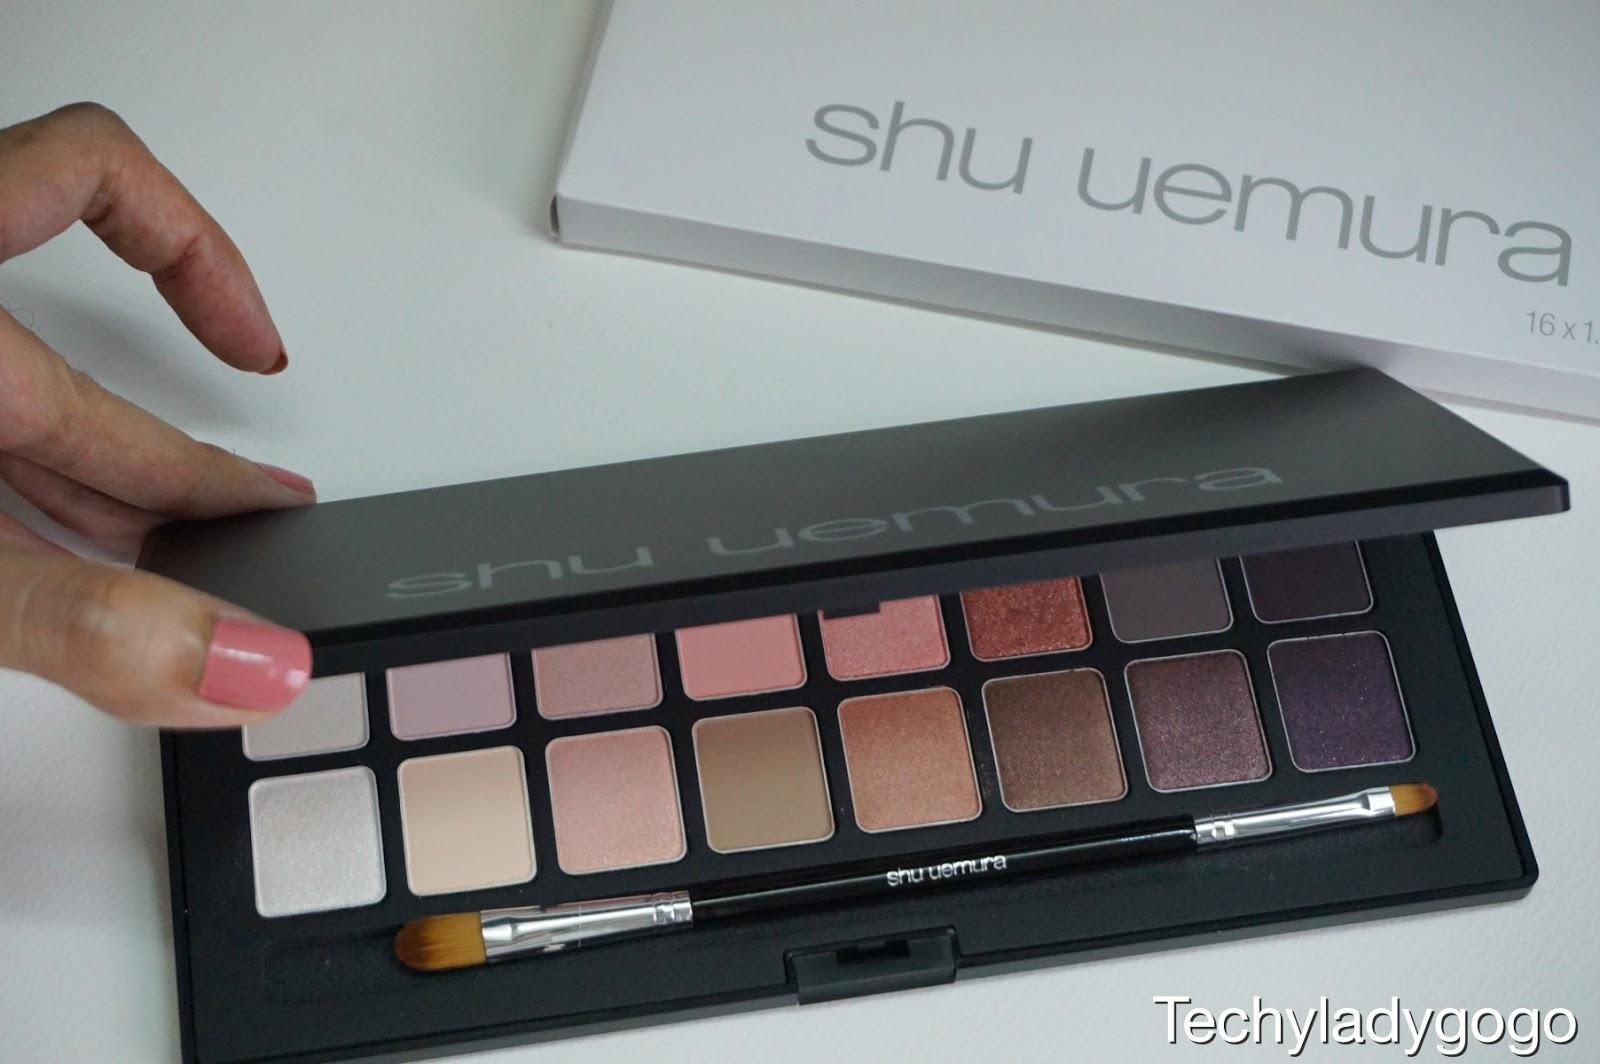 SHU UEMURA Blushing Beige Eyeshadow Palette พาเลทอายแชโดว์ระดับพรีเมี่ยมสุดคุ้ม